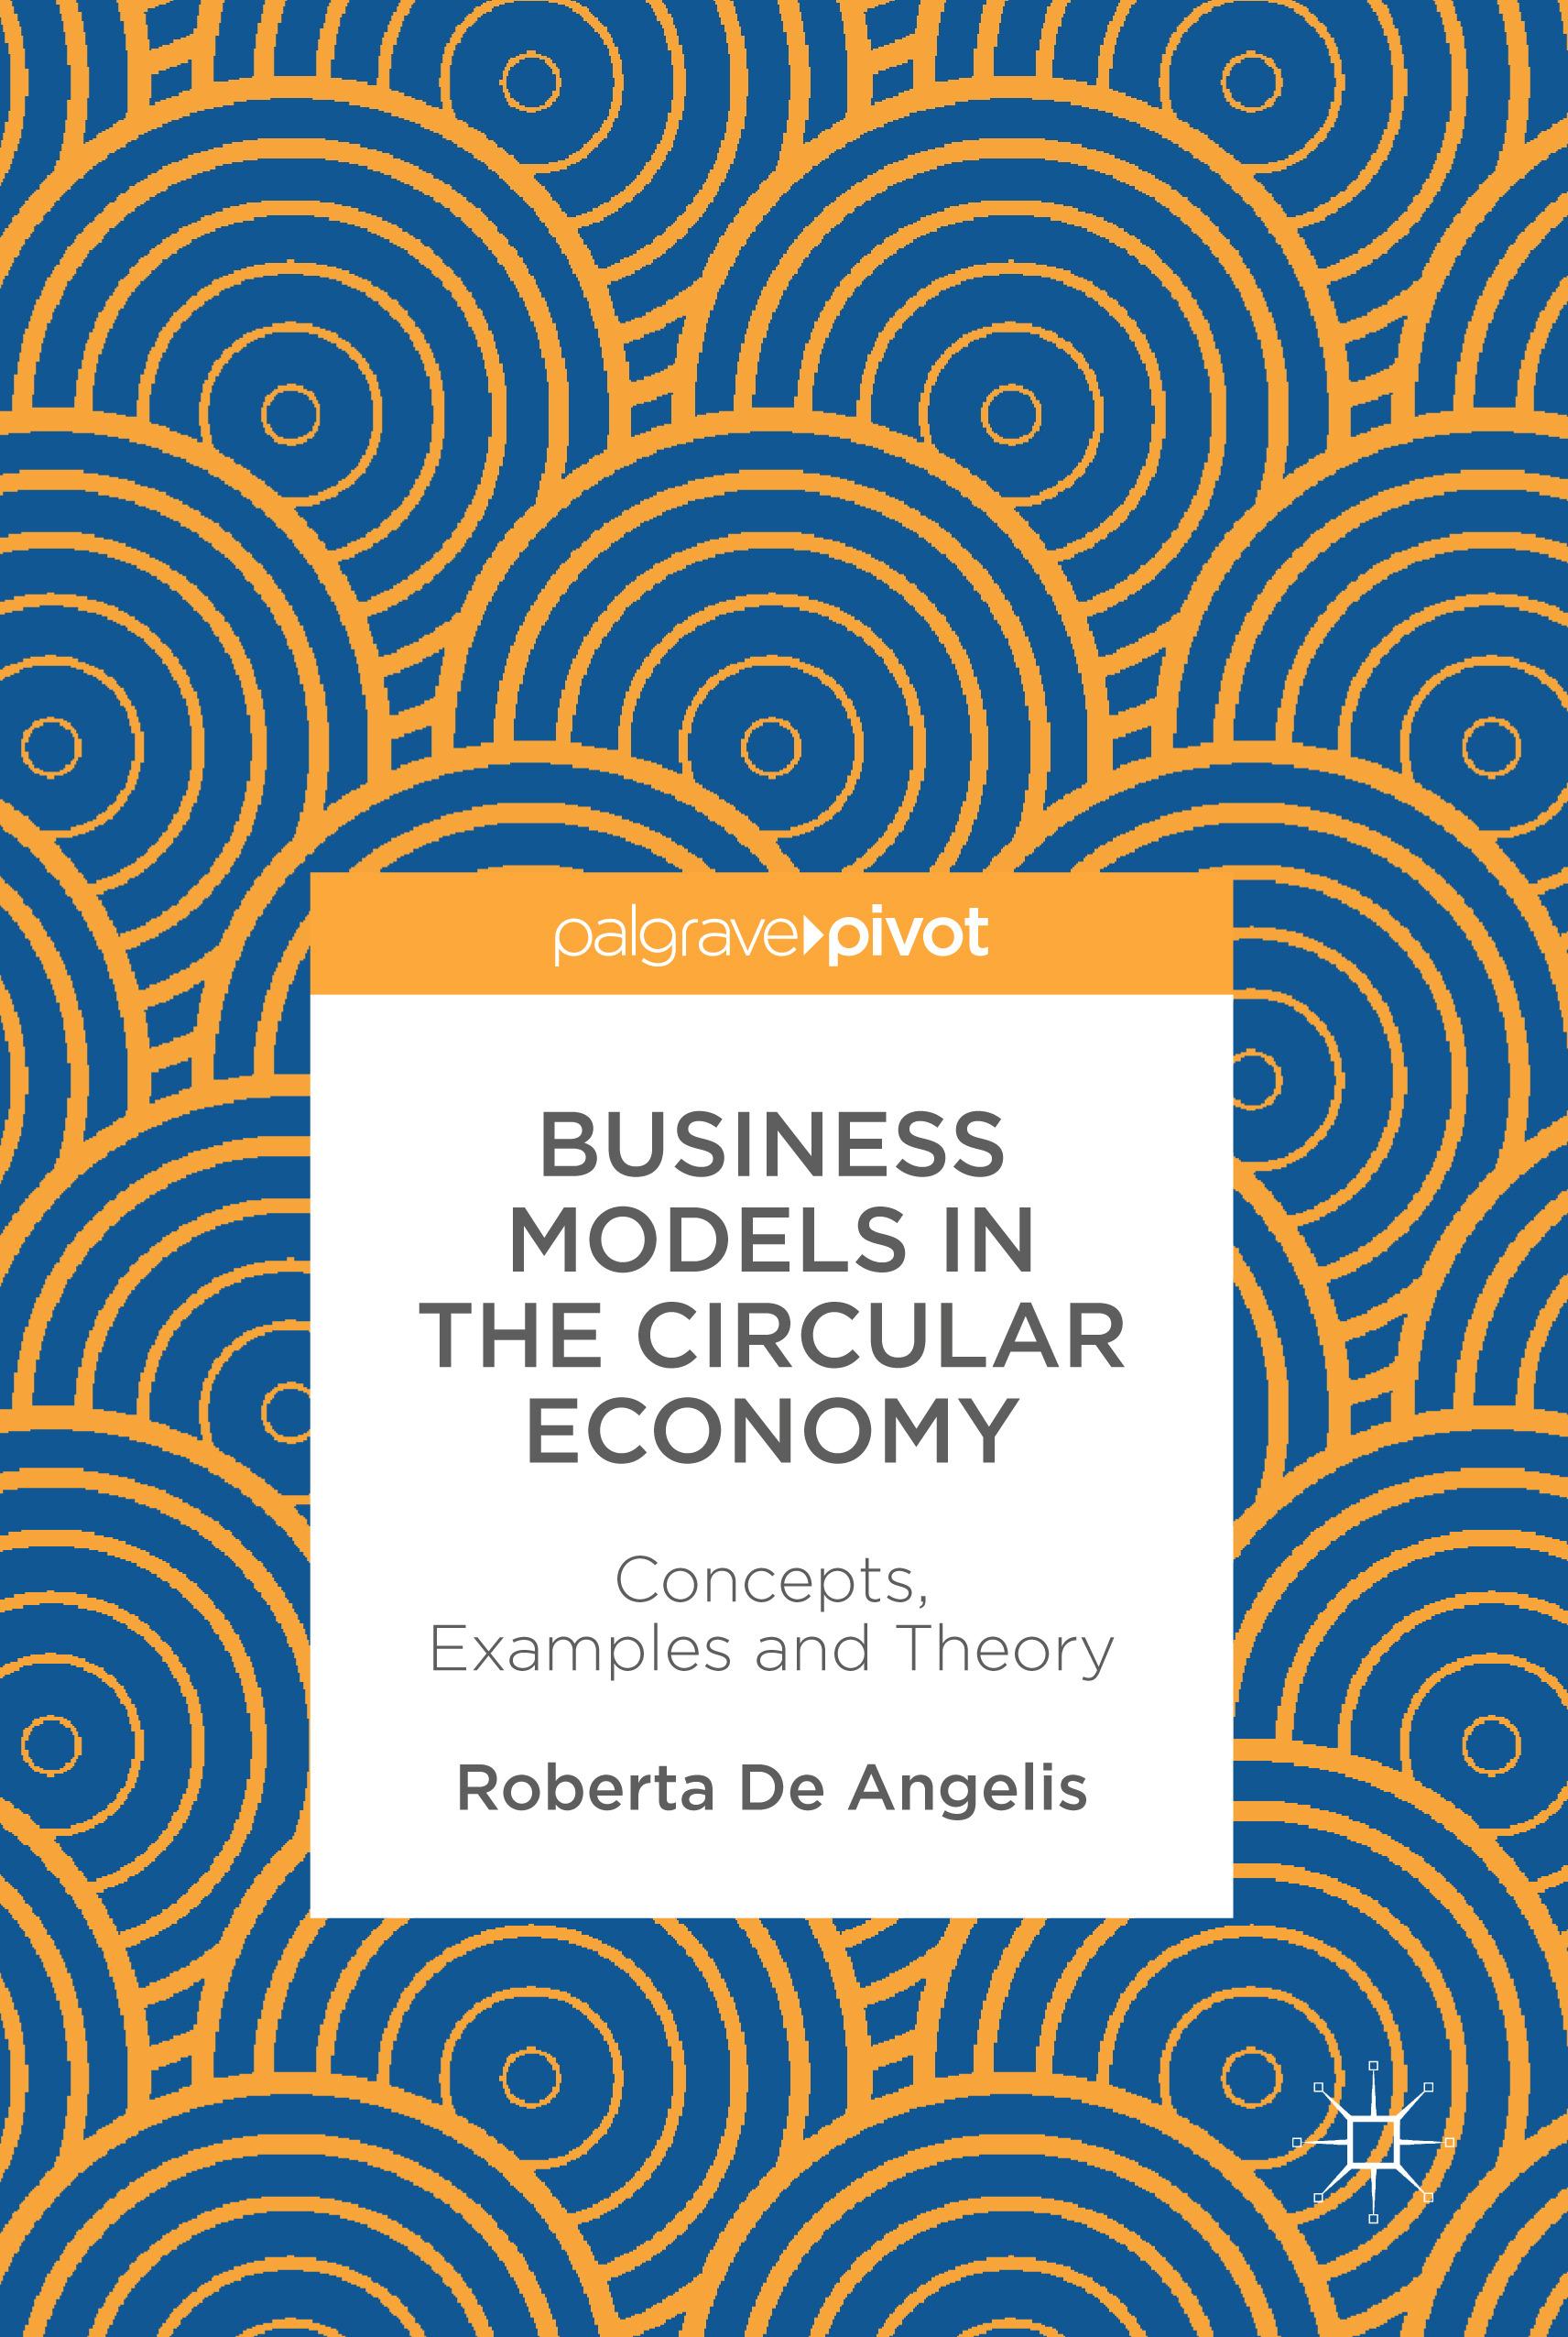 Angelis, Roberta De - Business Models in the Circular Economy, ebook